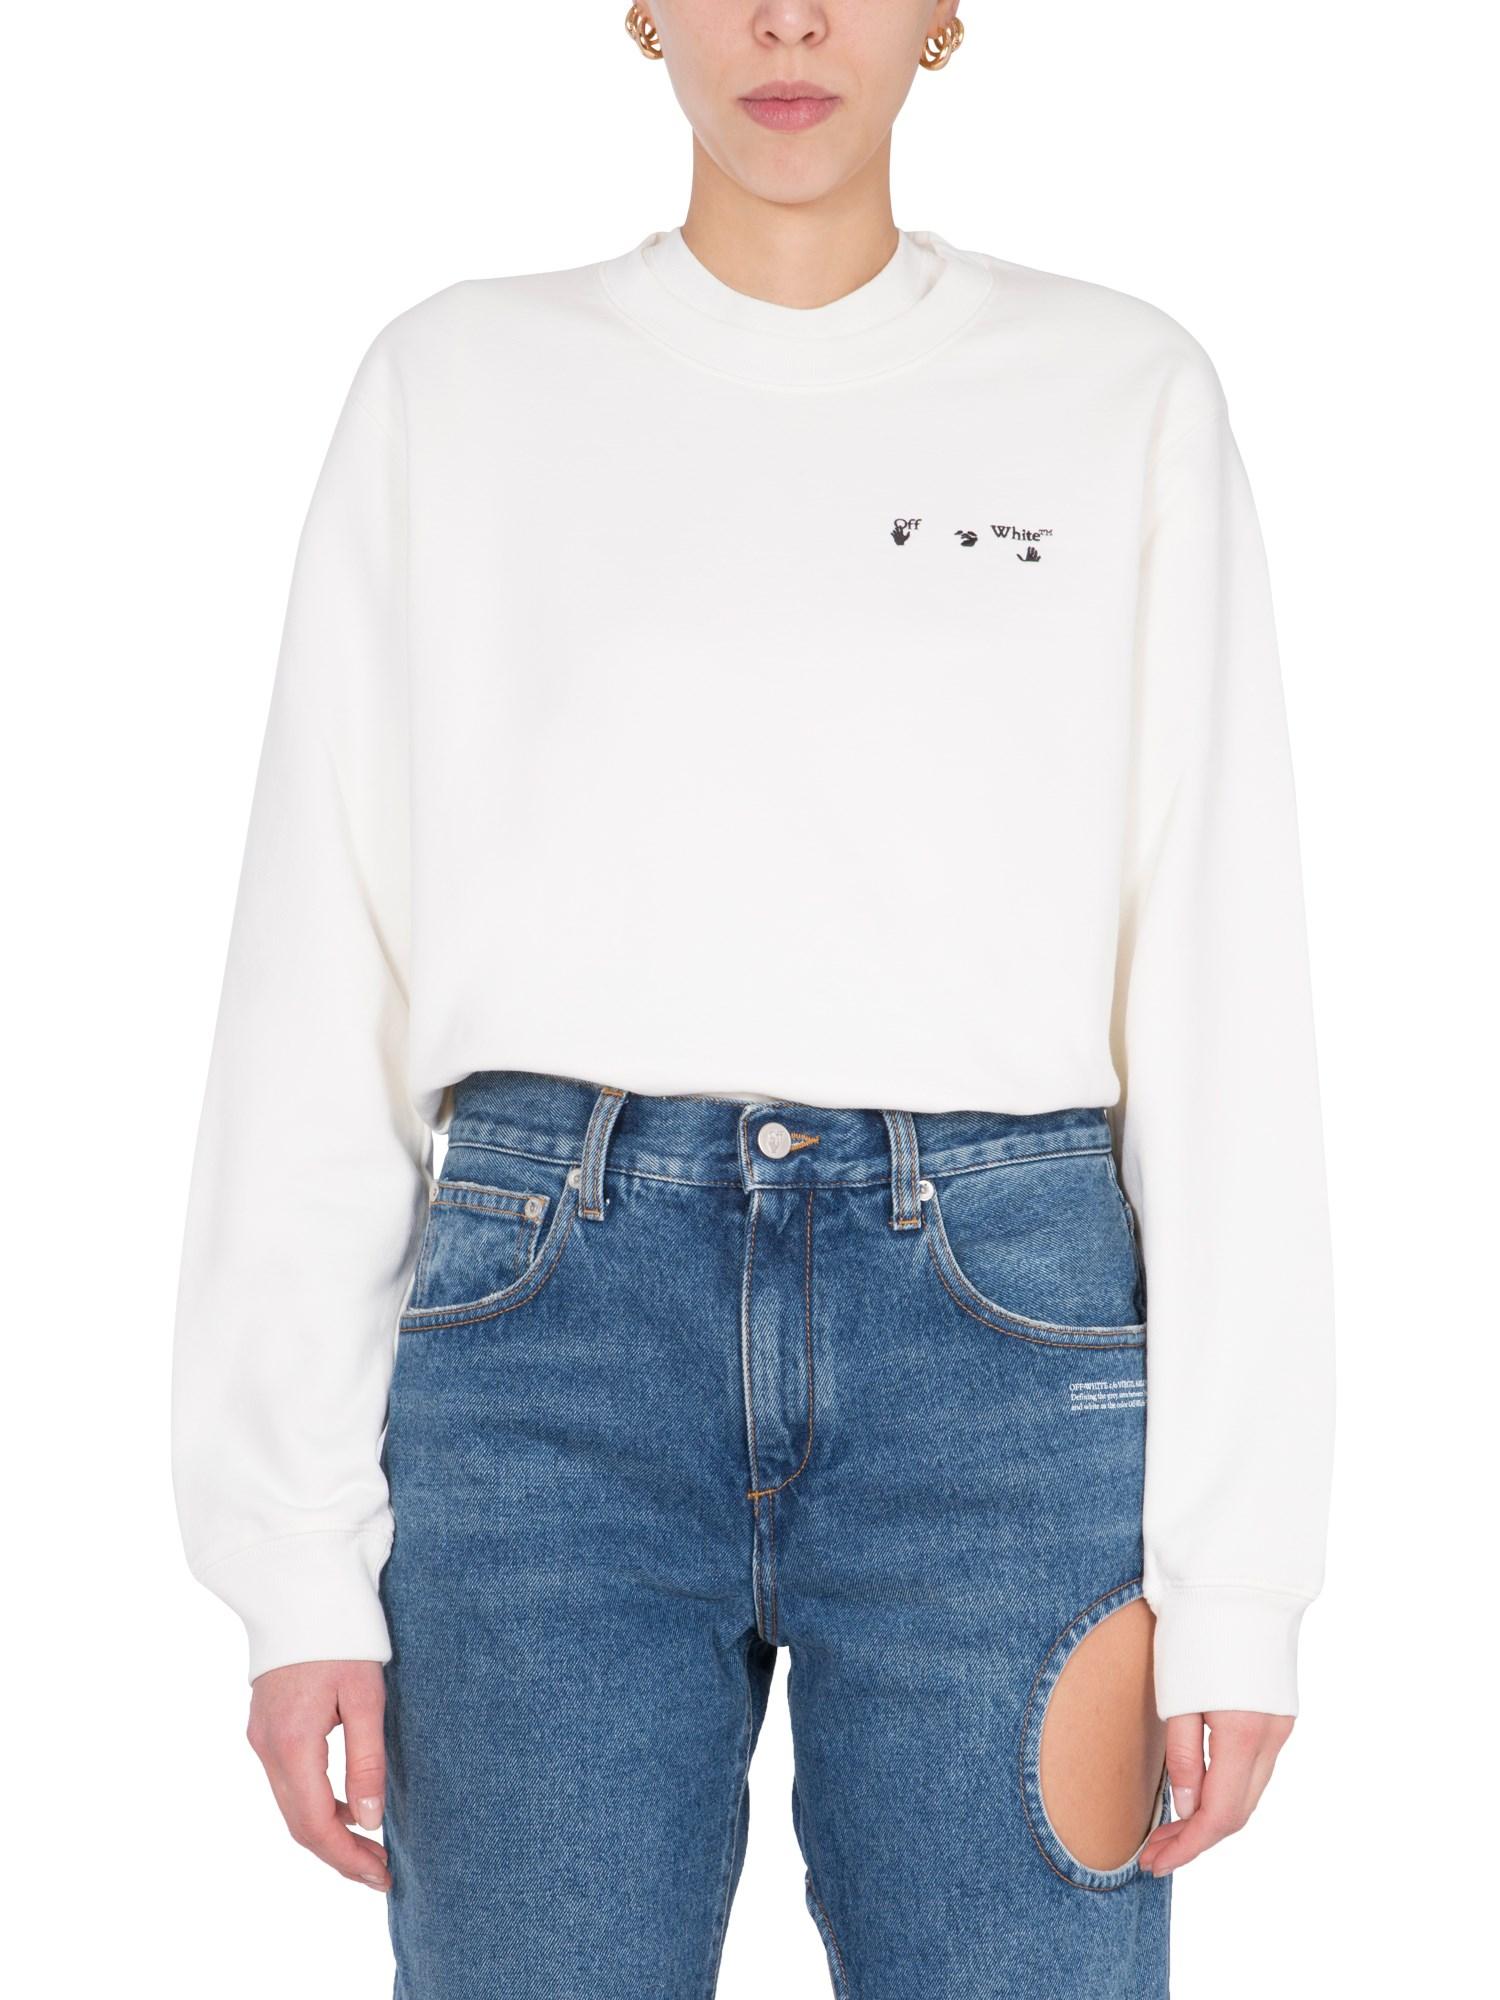 off-white sweatshirt with arrow print